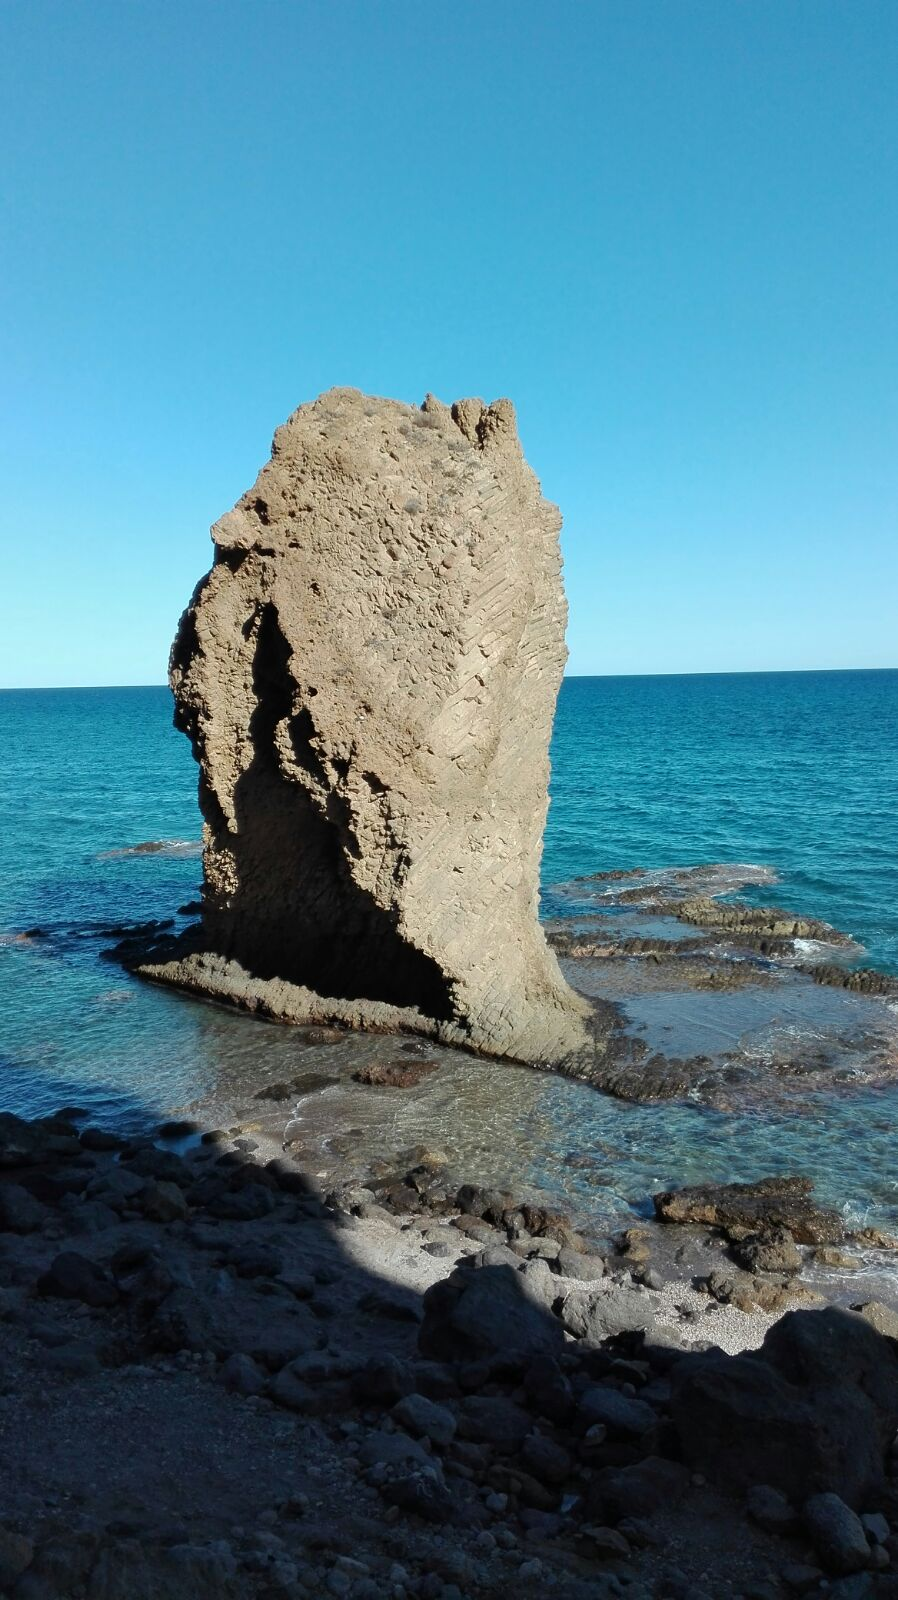 Peñon de la playa del Sobrerico